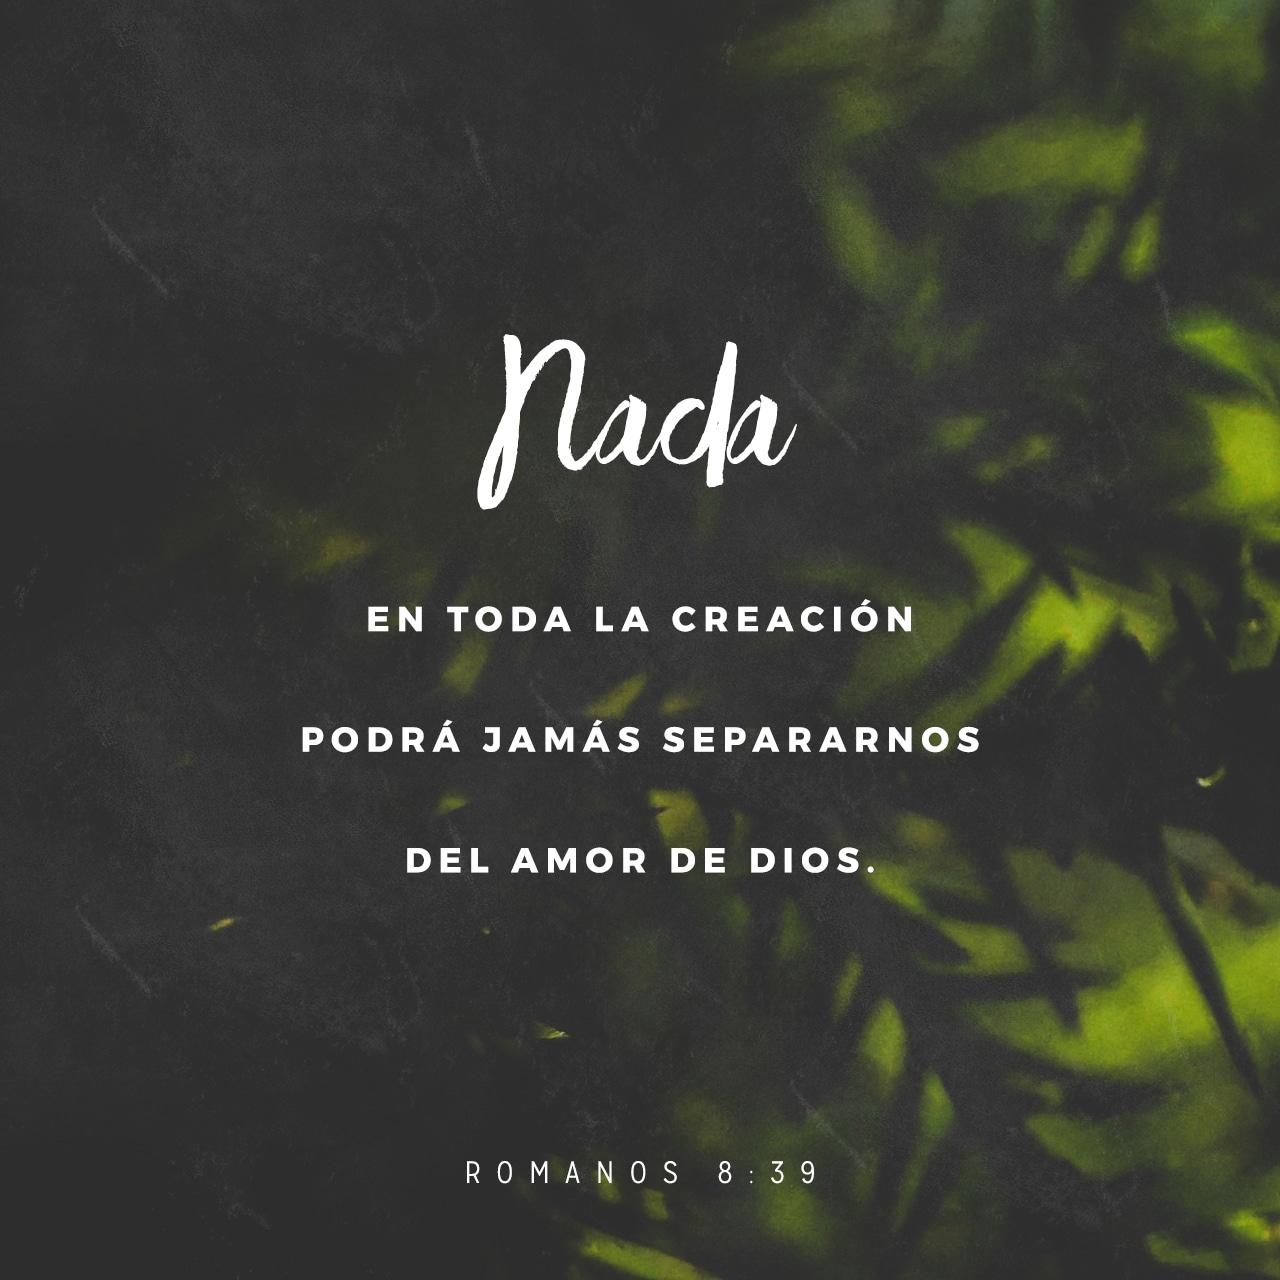 Romans 8:39 (JPG)